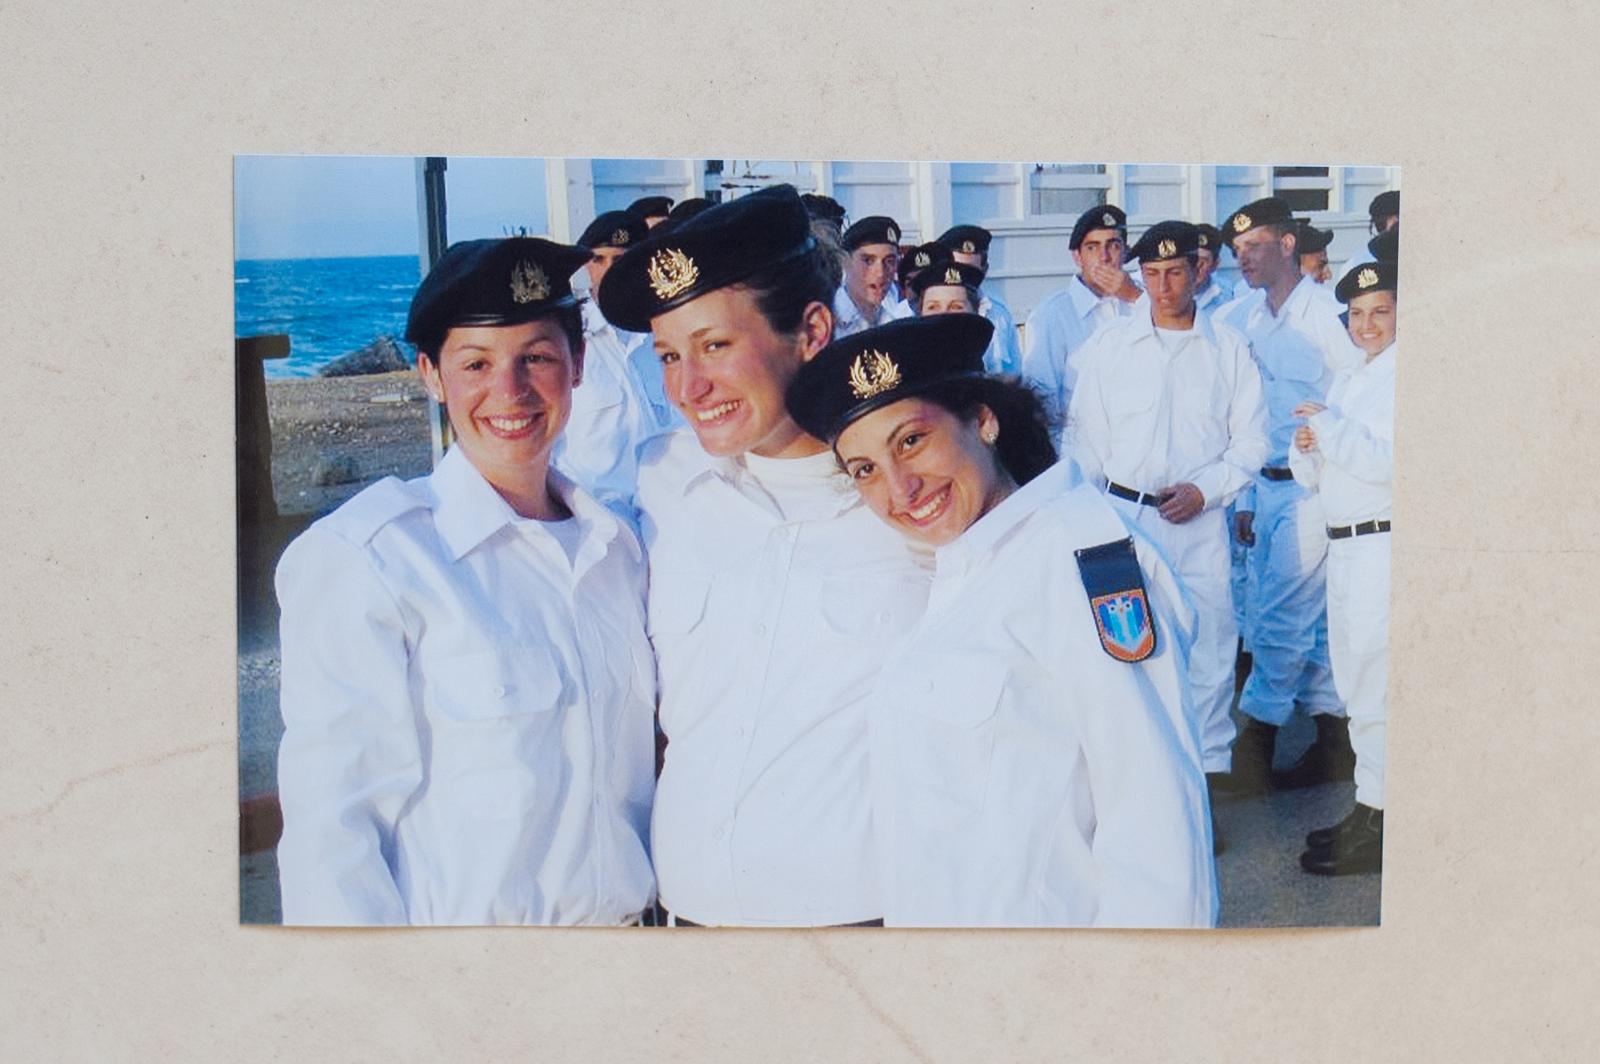 Sapir served in the Israeli navy.